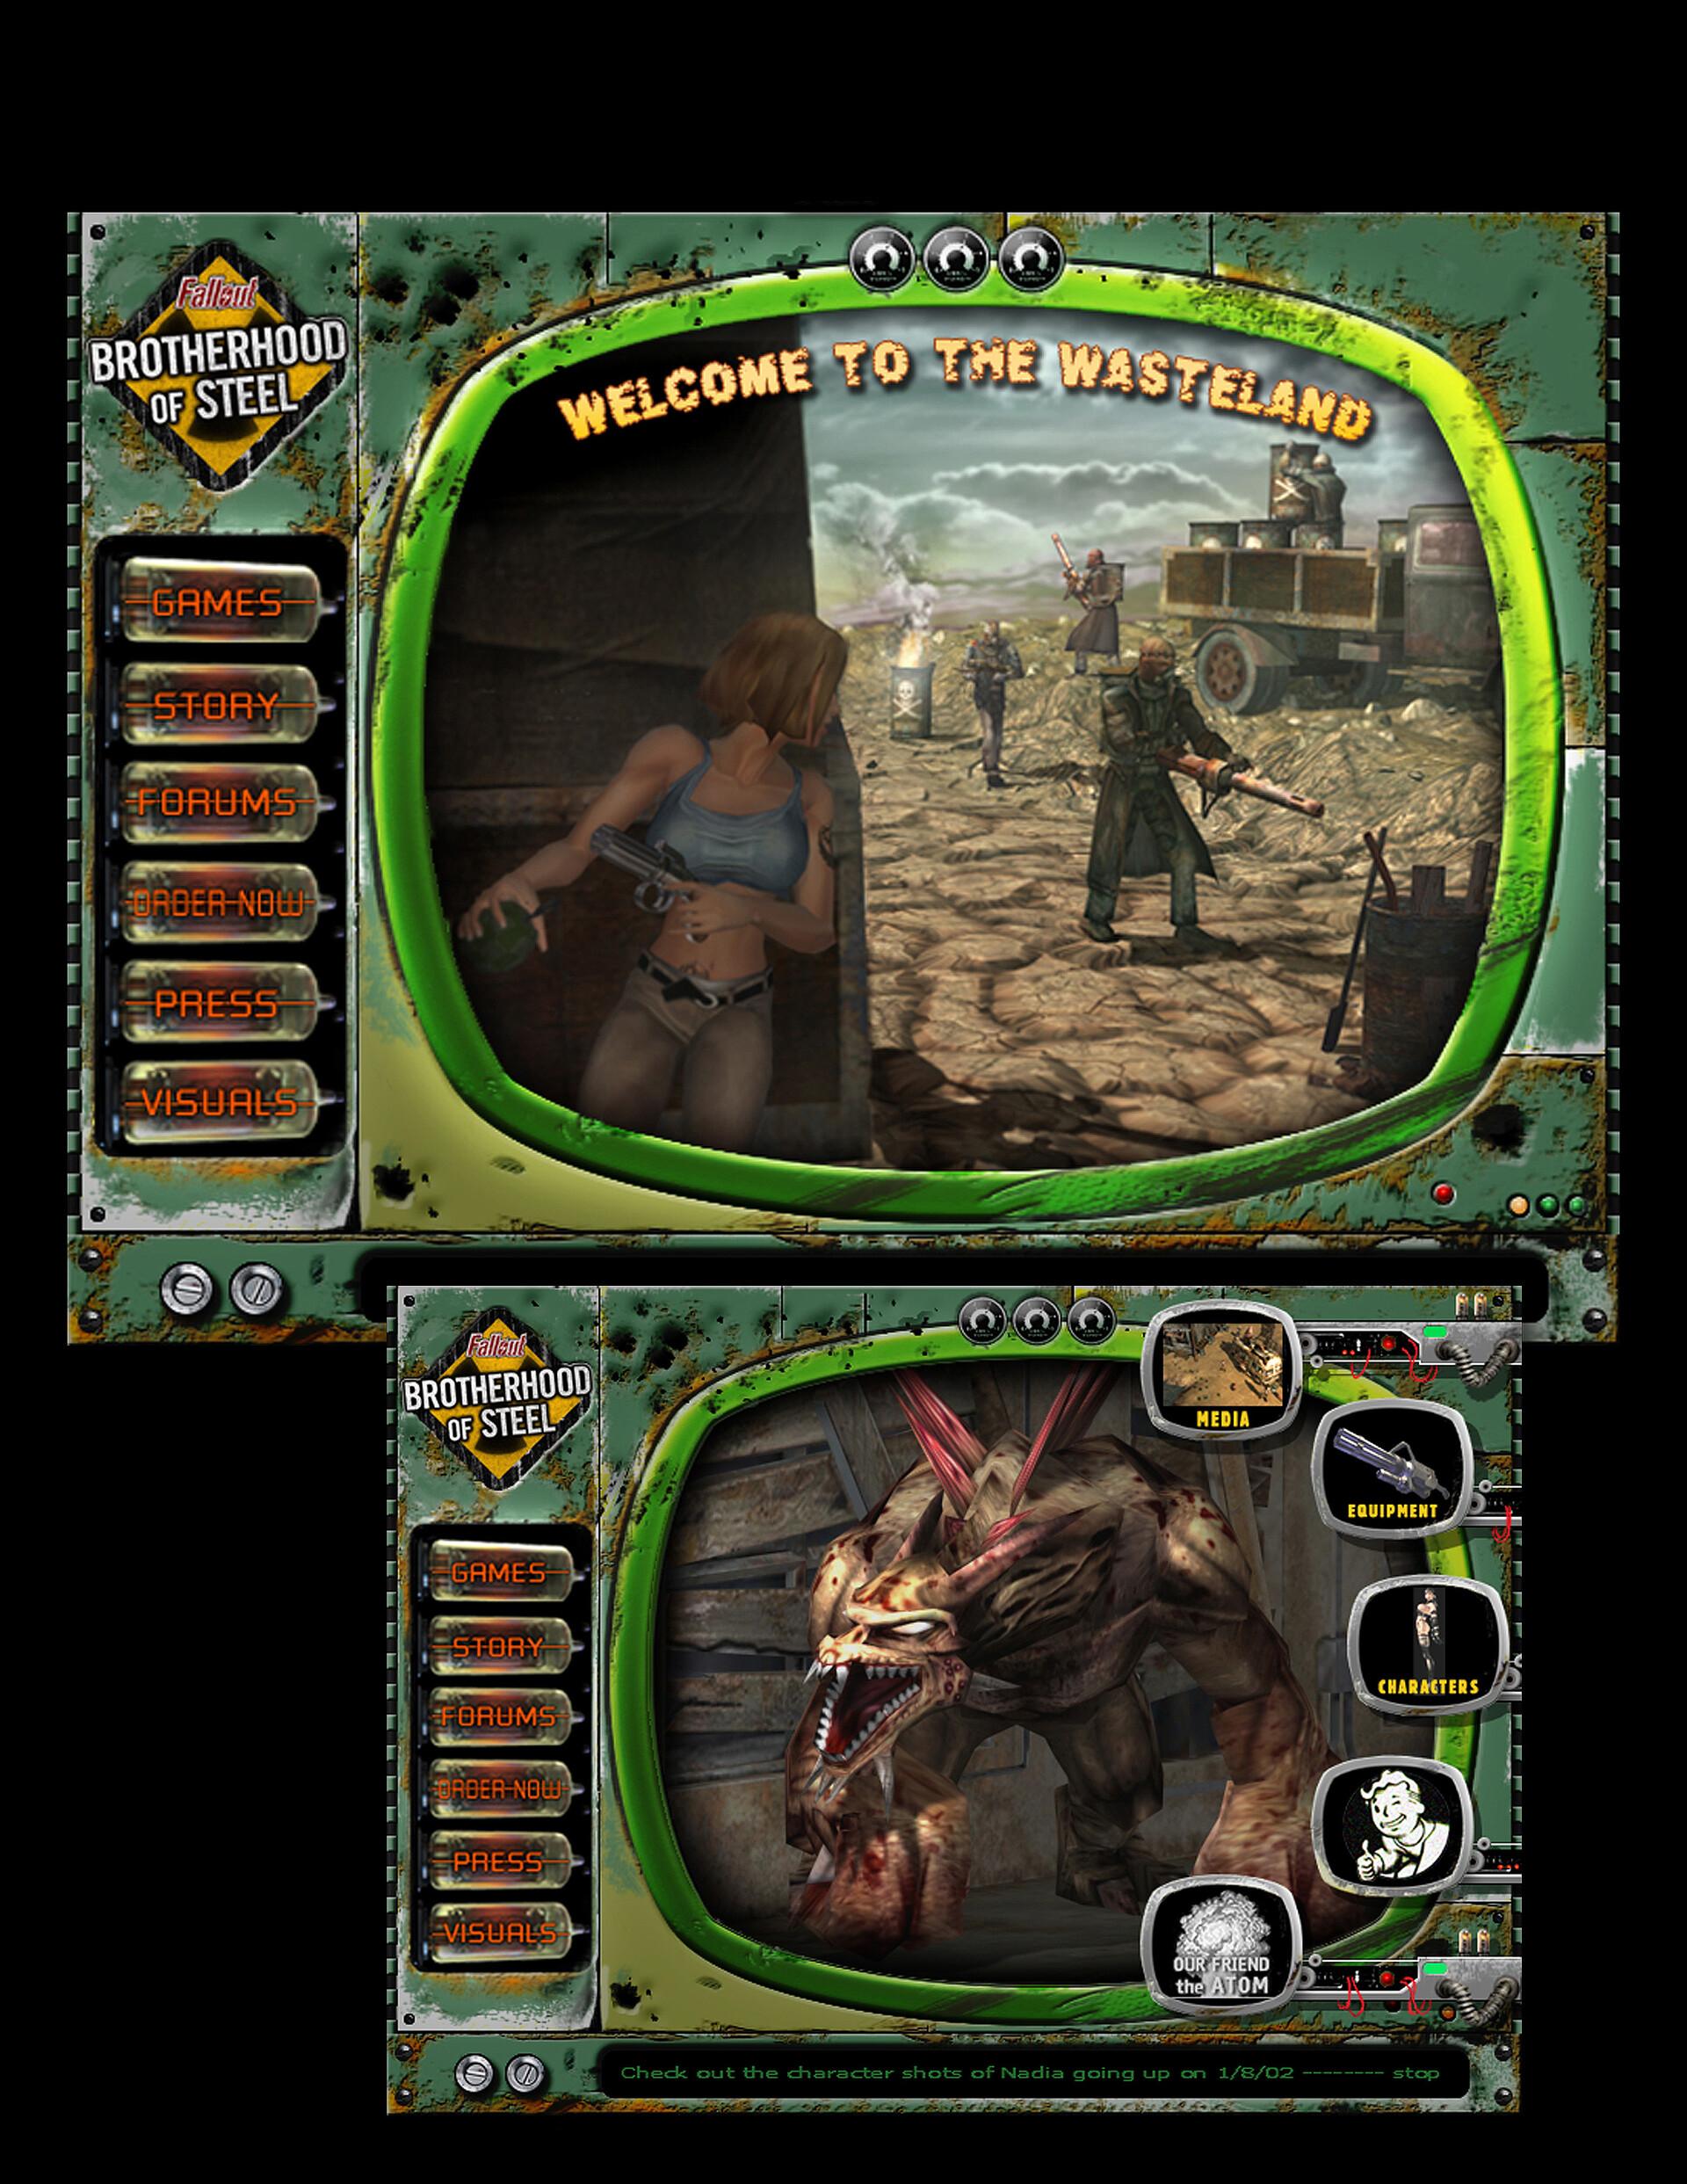 Fallout BOS.com